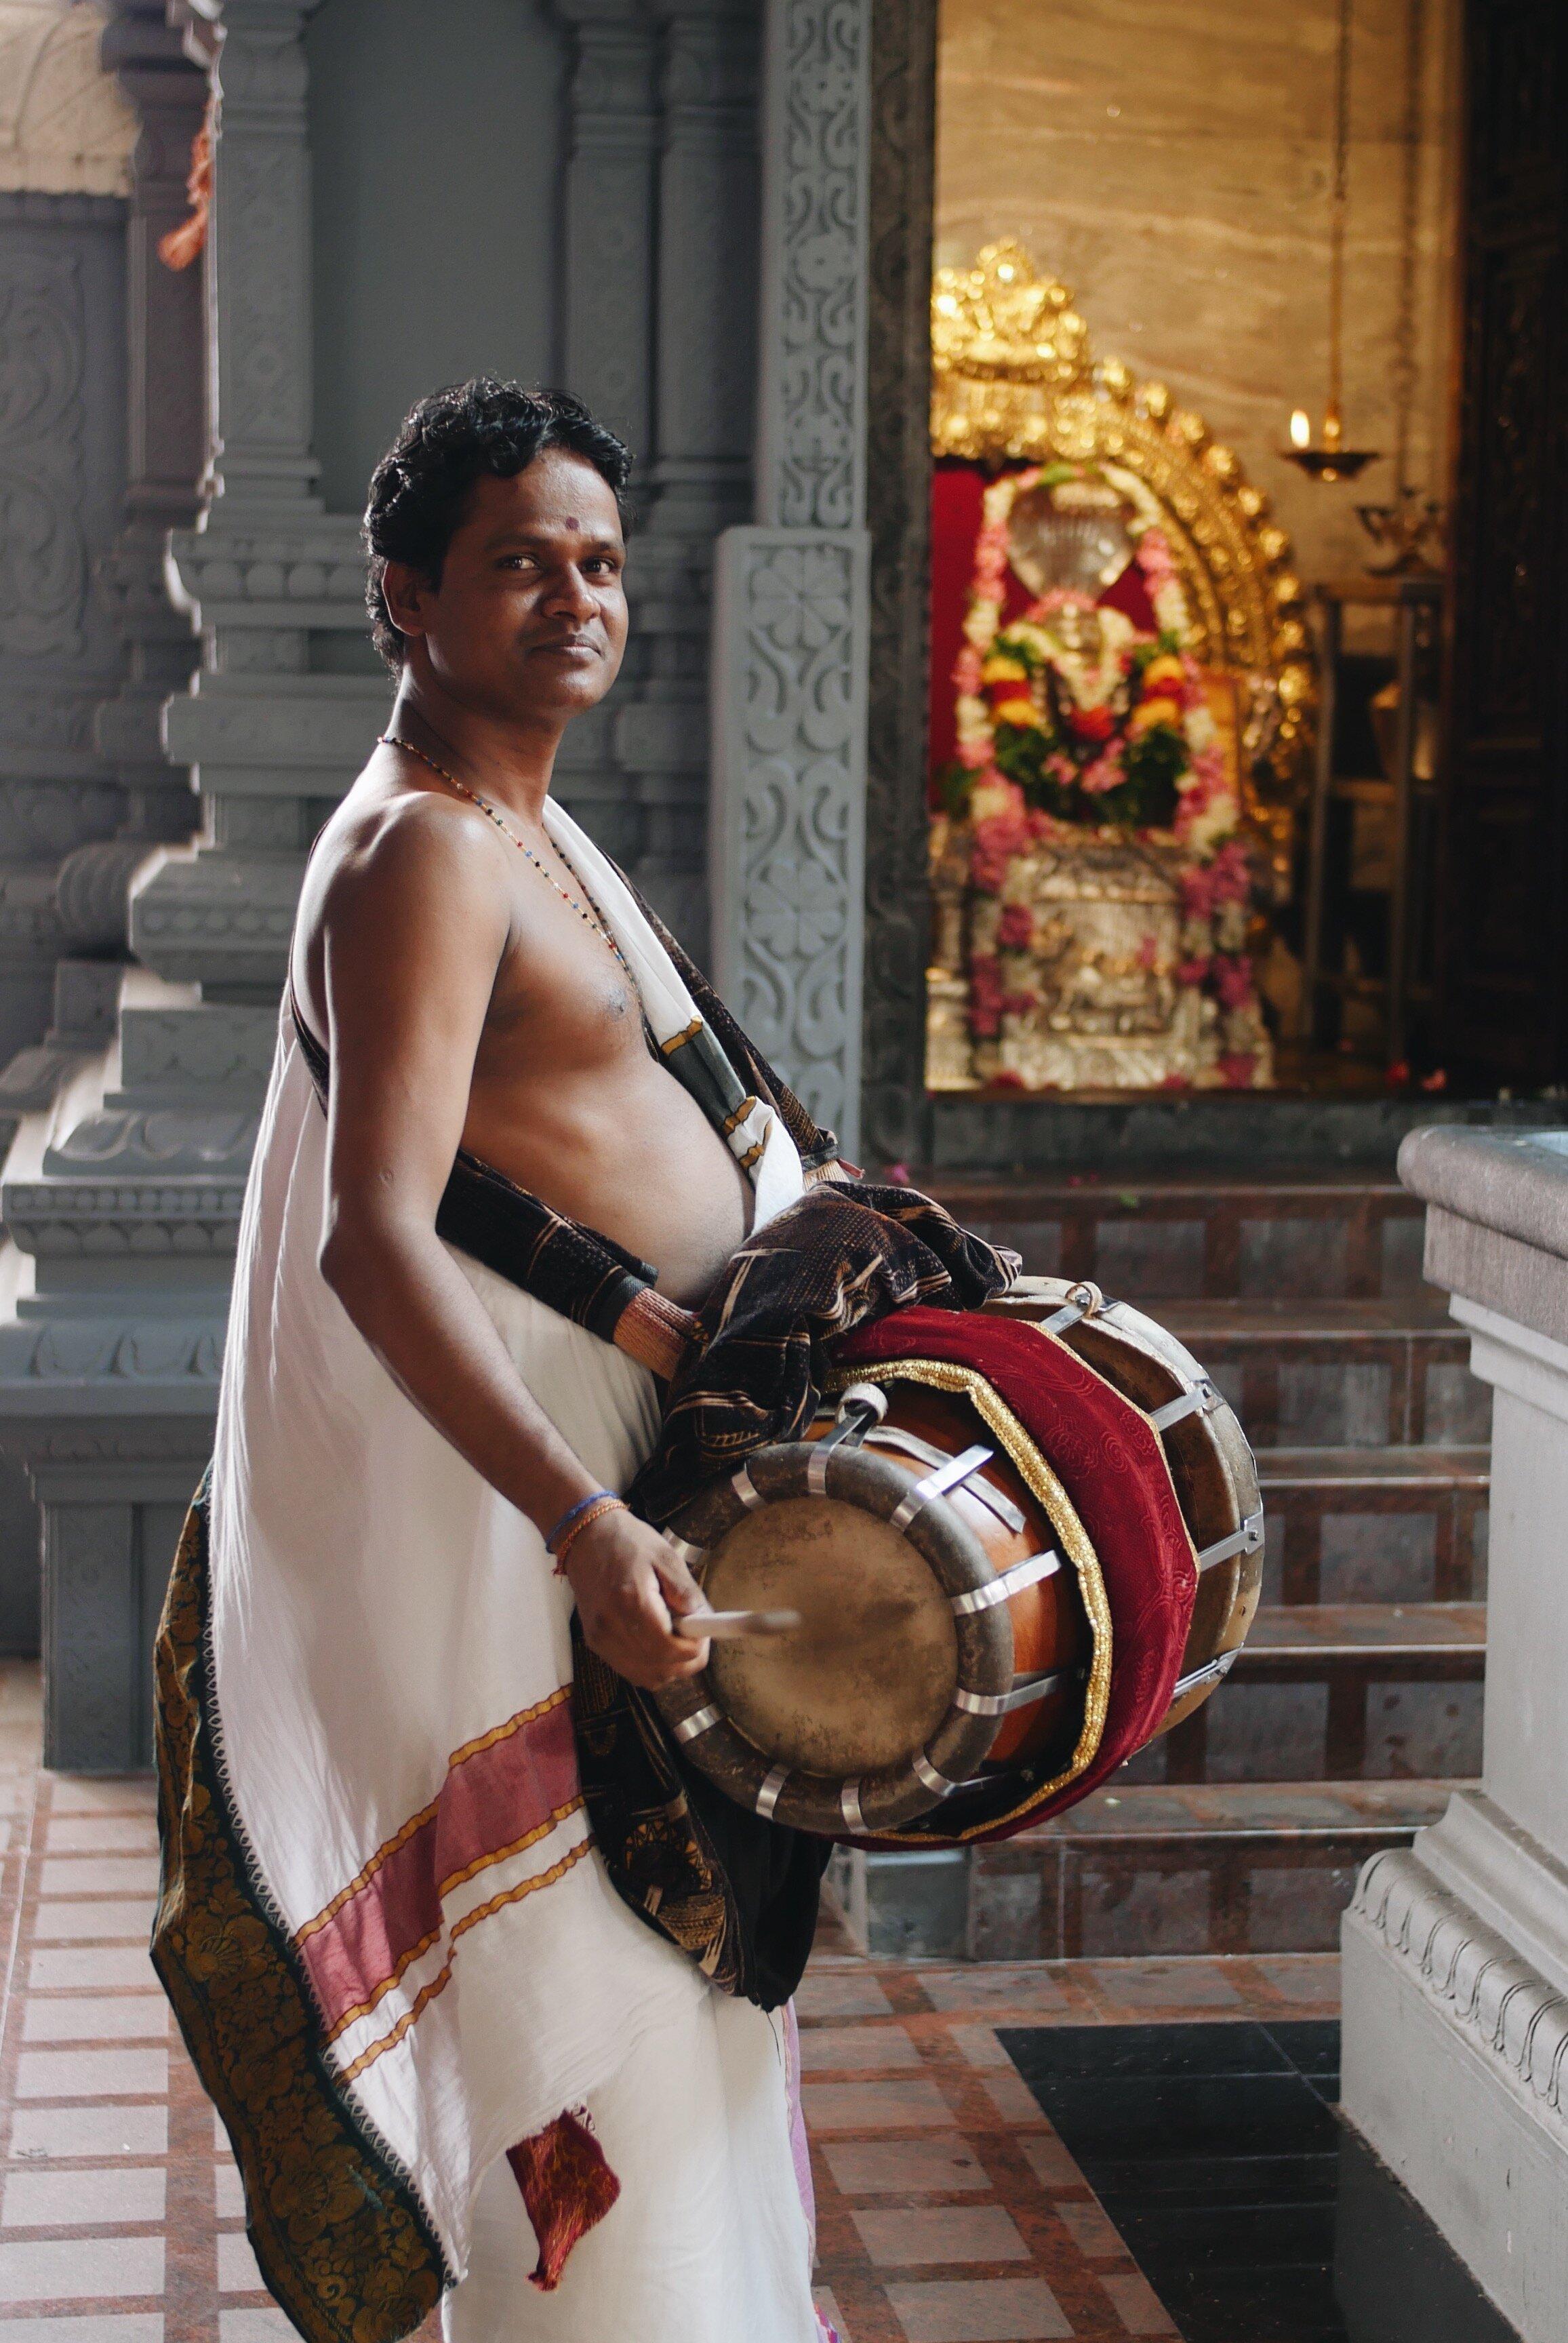 A Shakta Archaka at a Goddess Temple